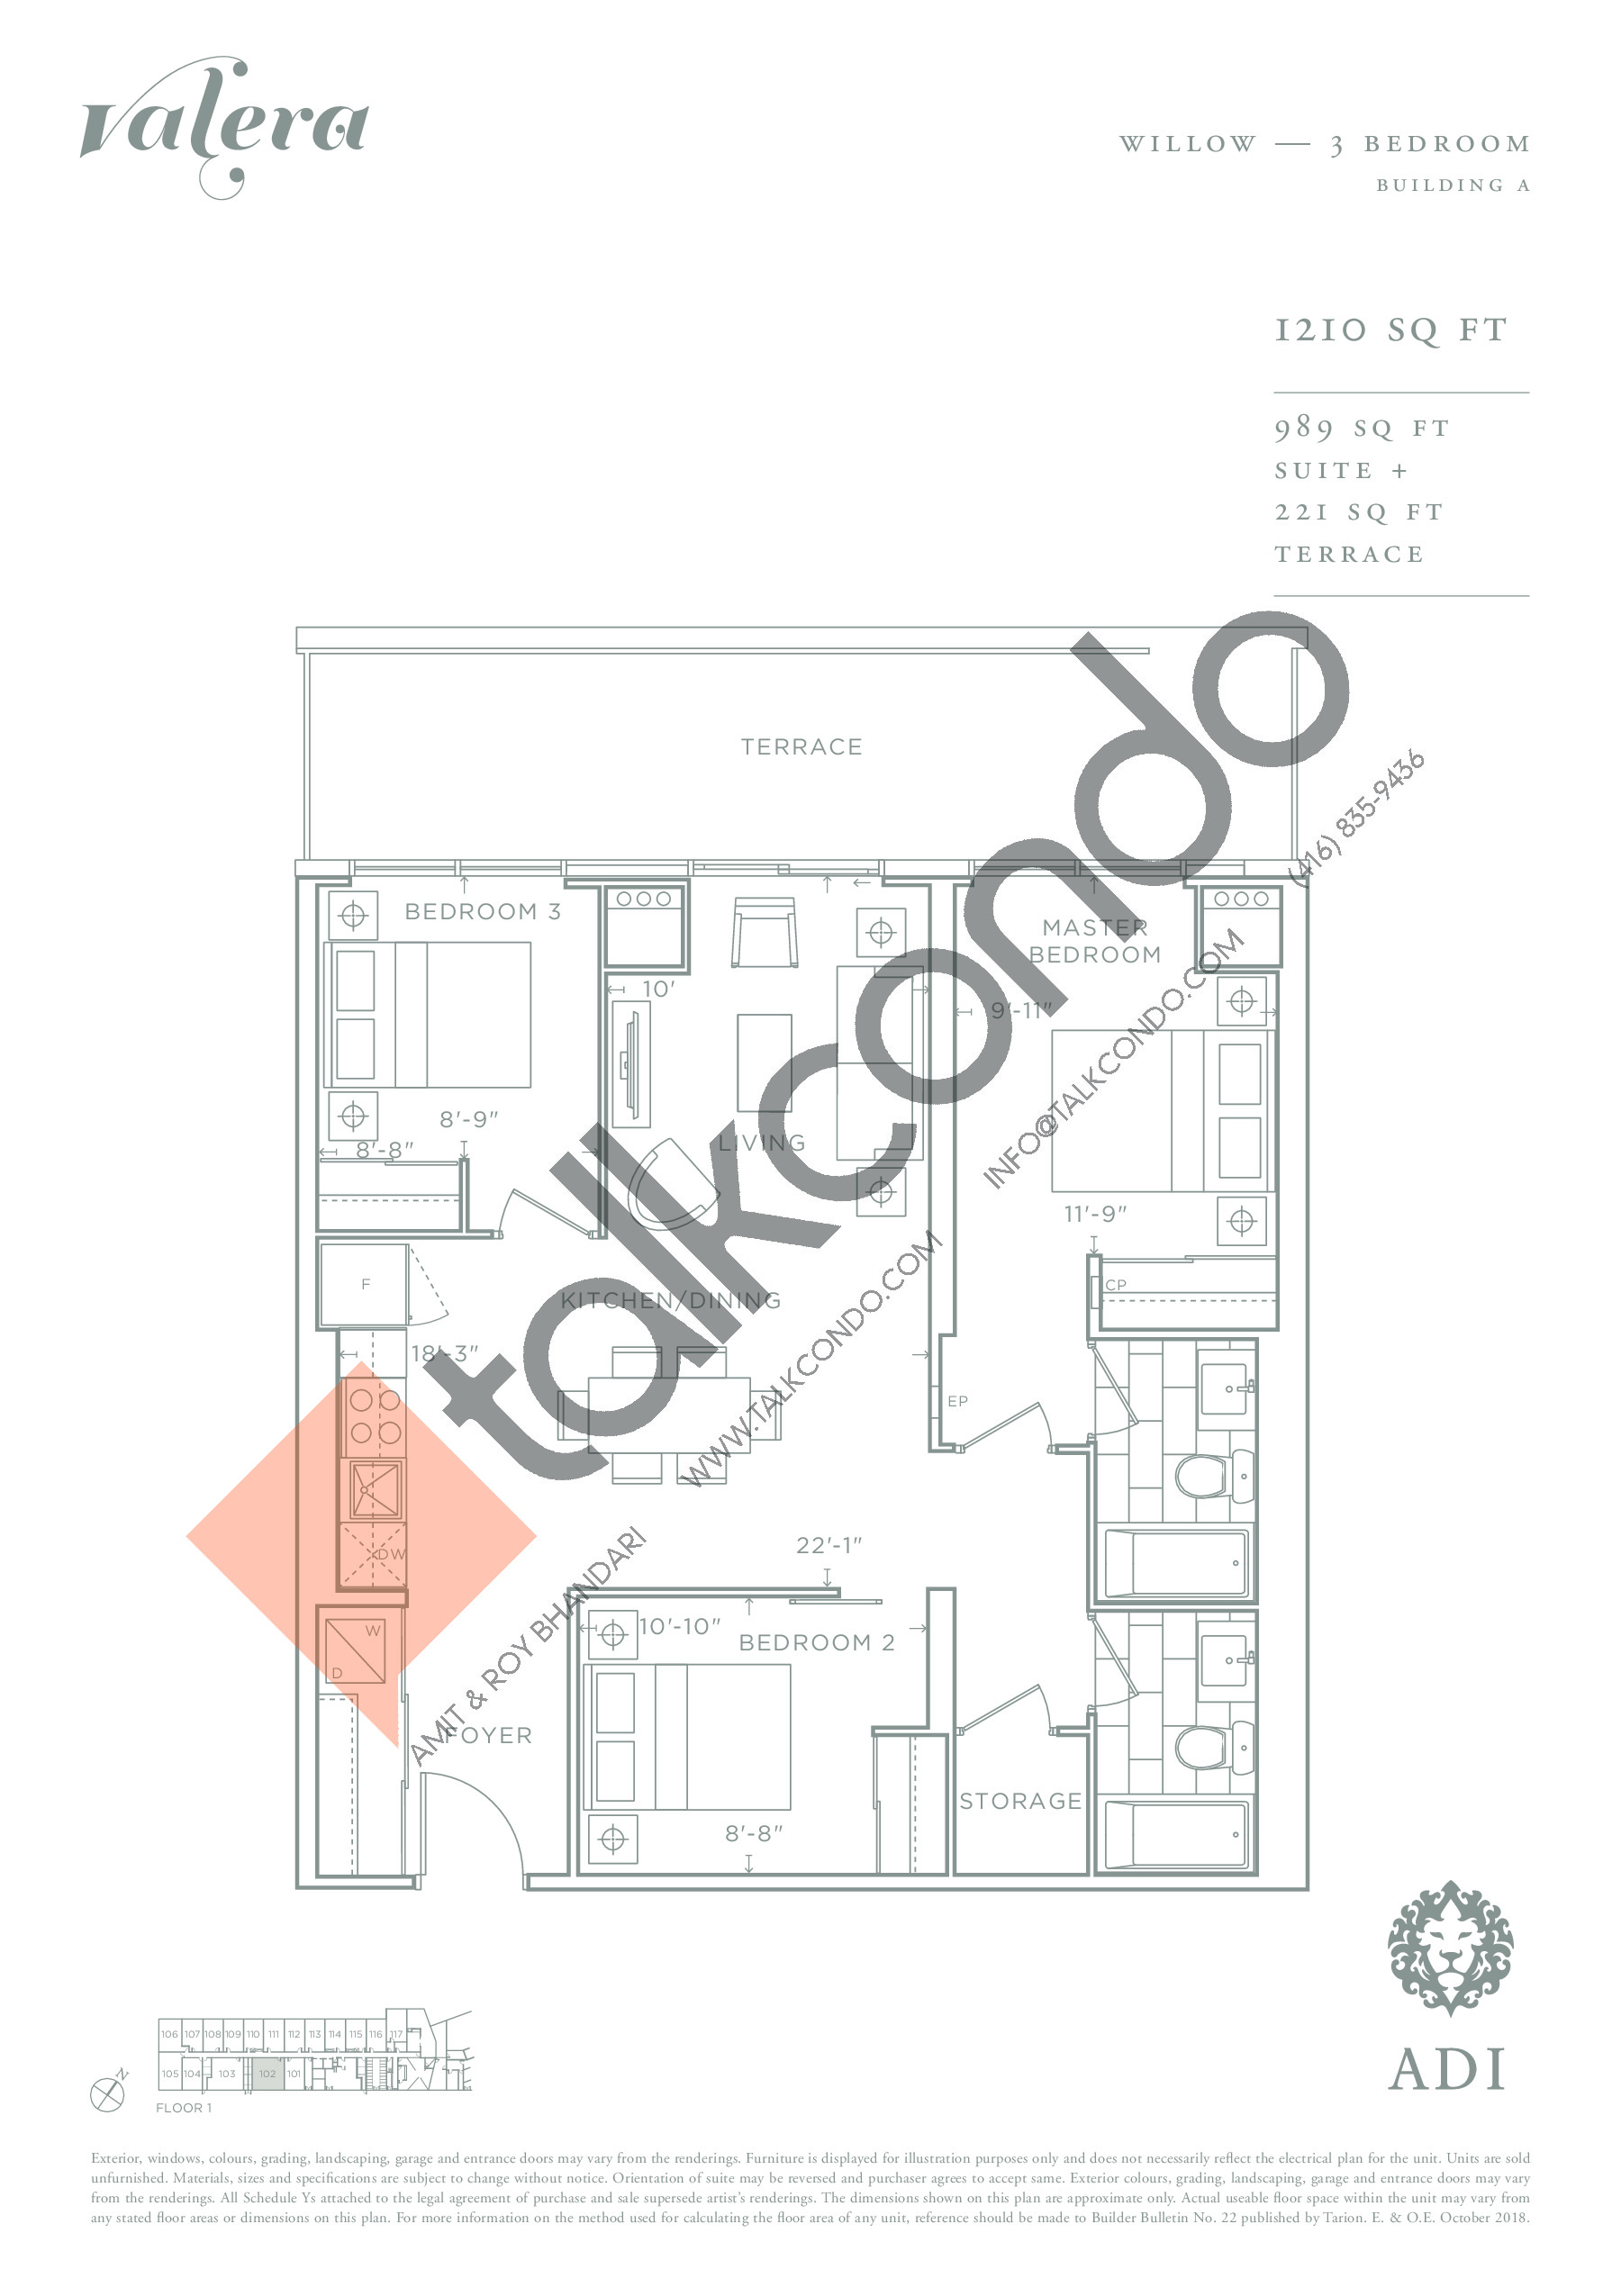 Willow Floor Plan at Valera Condos - 989 sq.ft